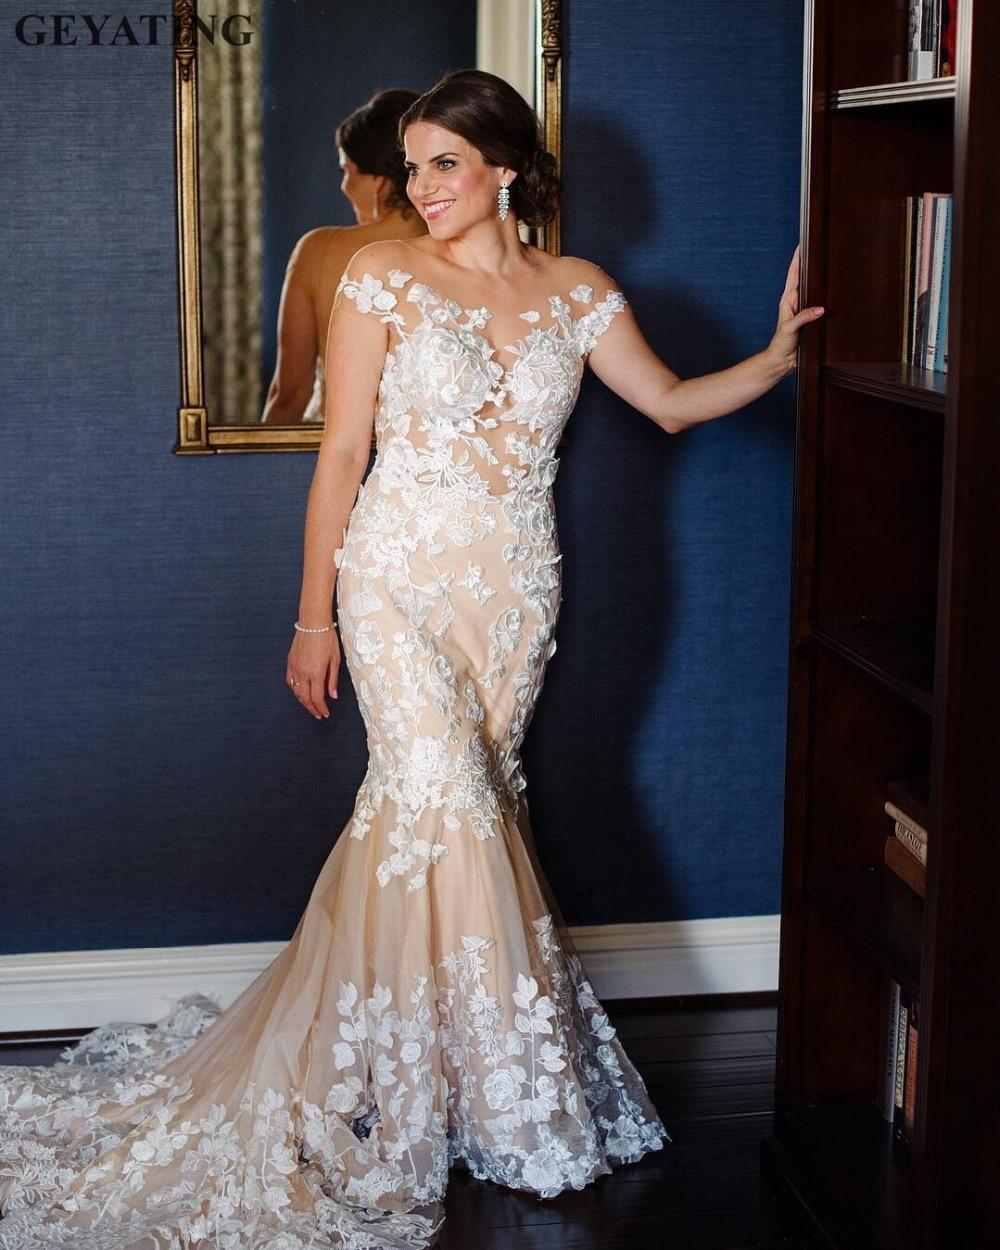 Vintage Wedding Dresses Amsterdam: Aliexpress.com : Buy Vintage Ivory Lace Champagne Mermaid